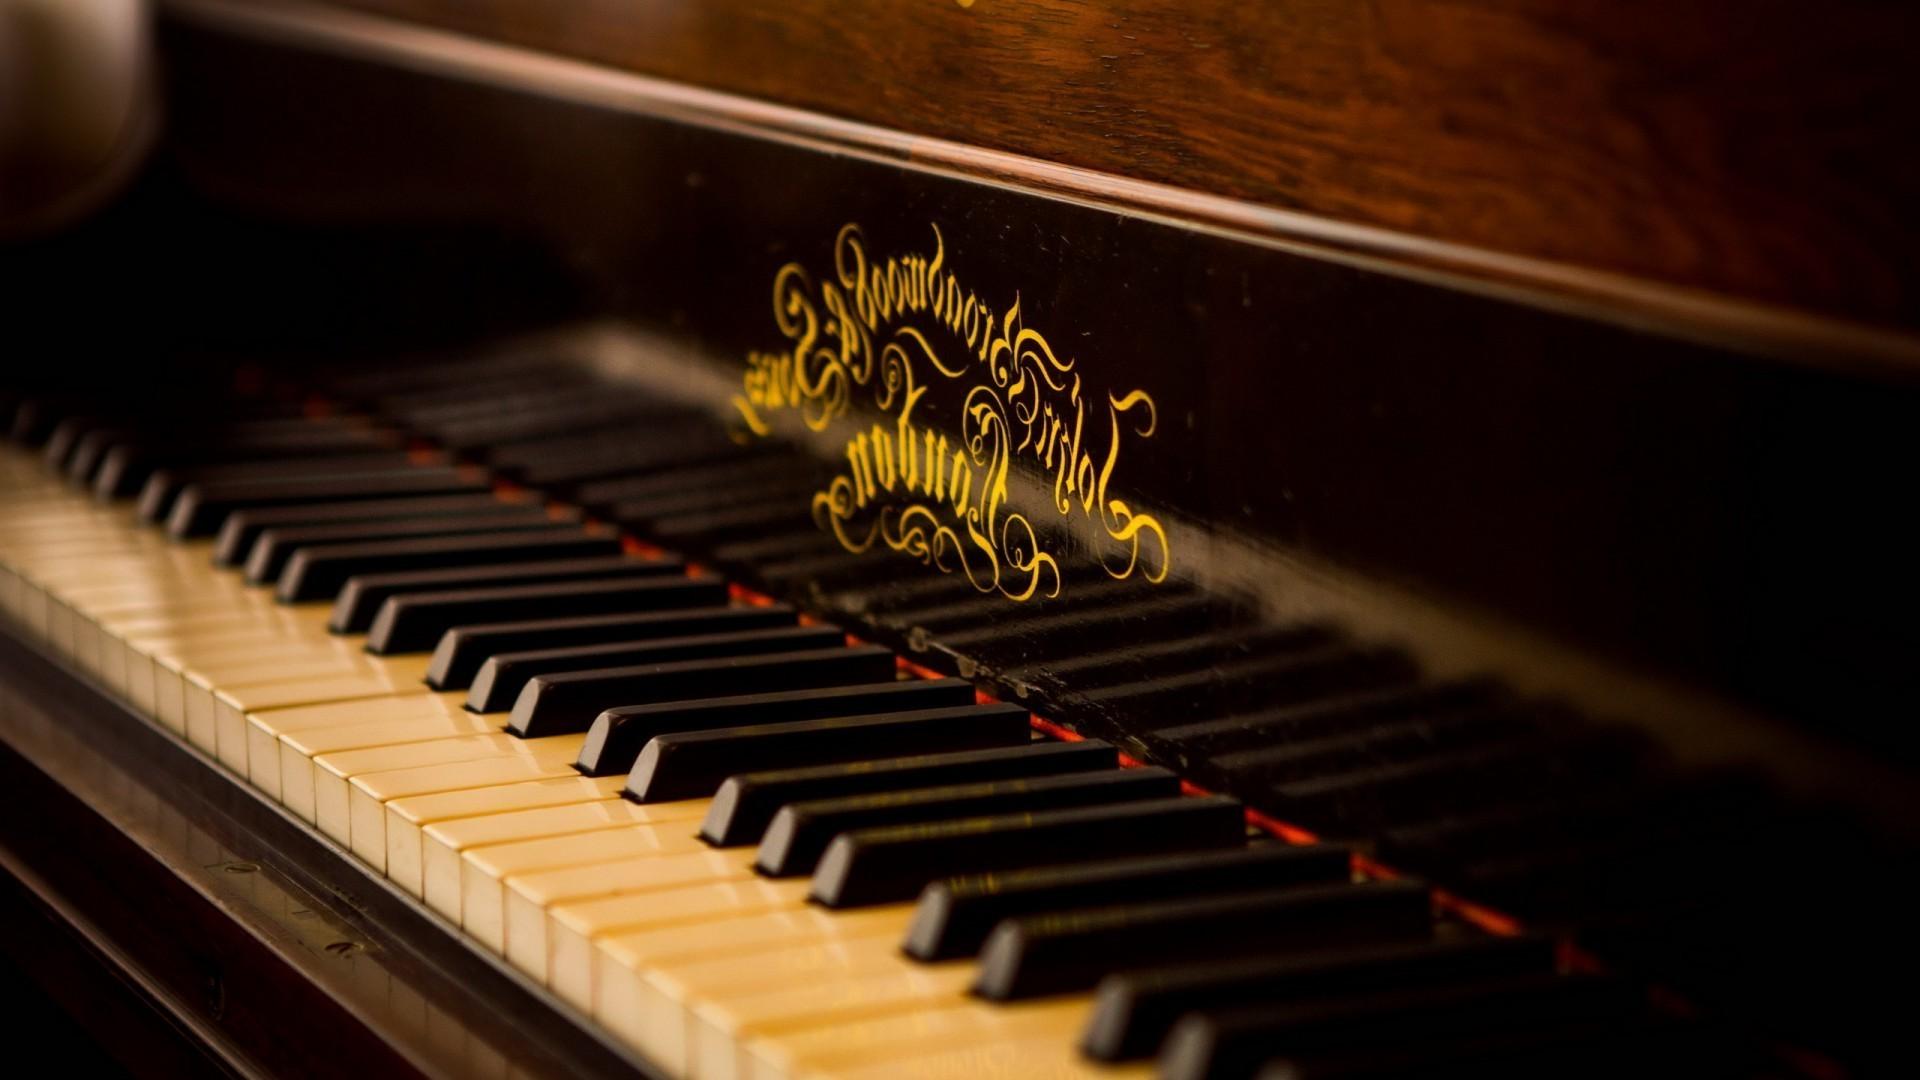 instruments keyboard wallpaper - photo #6